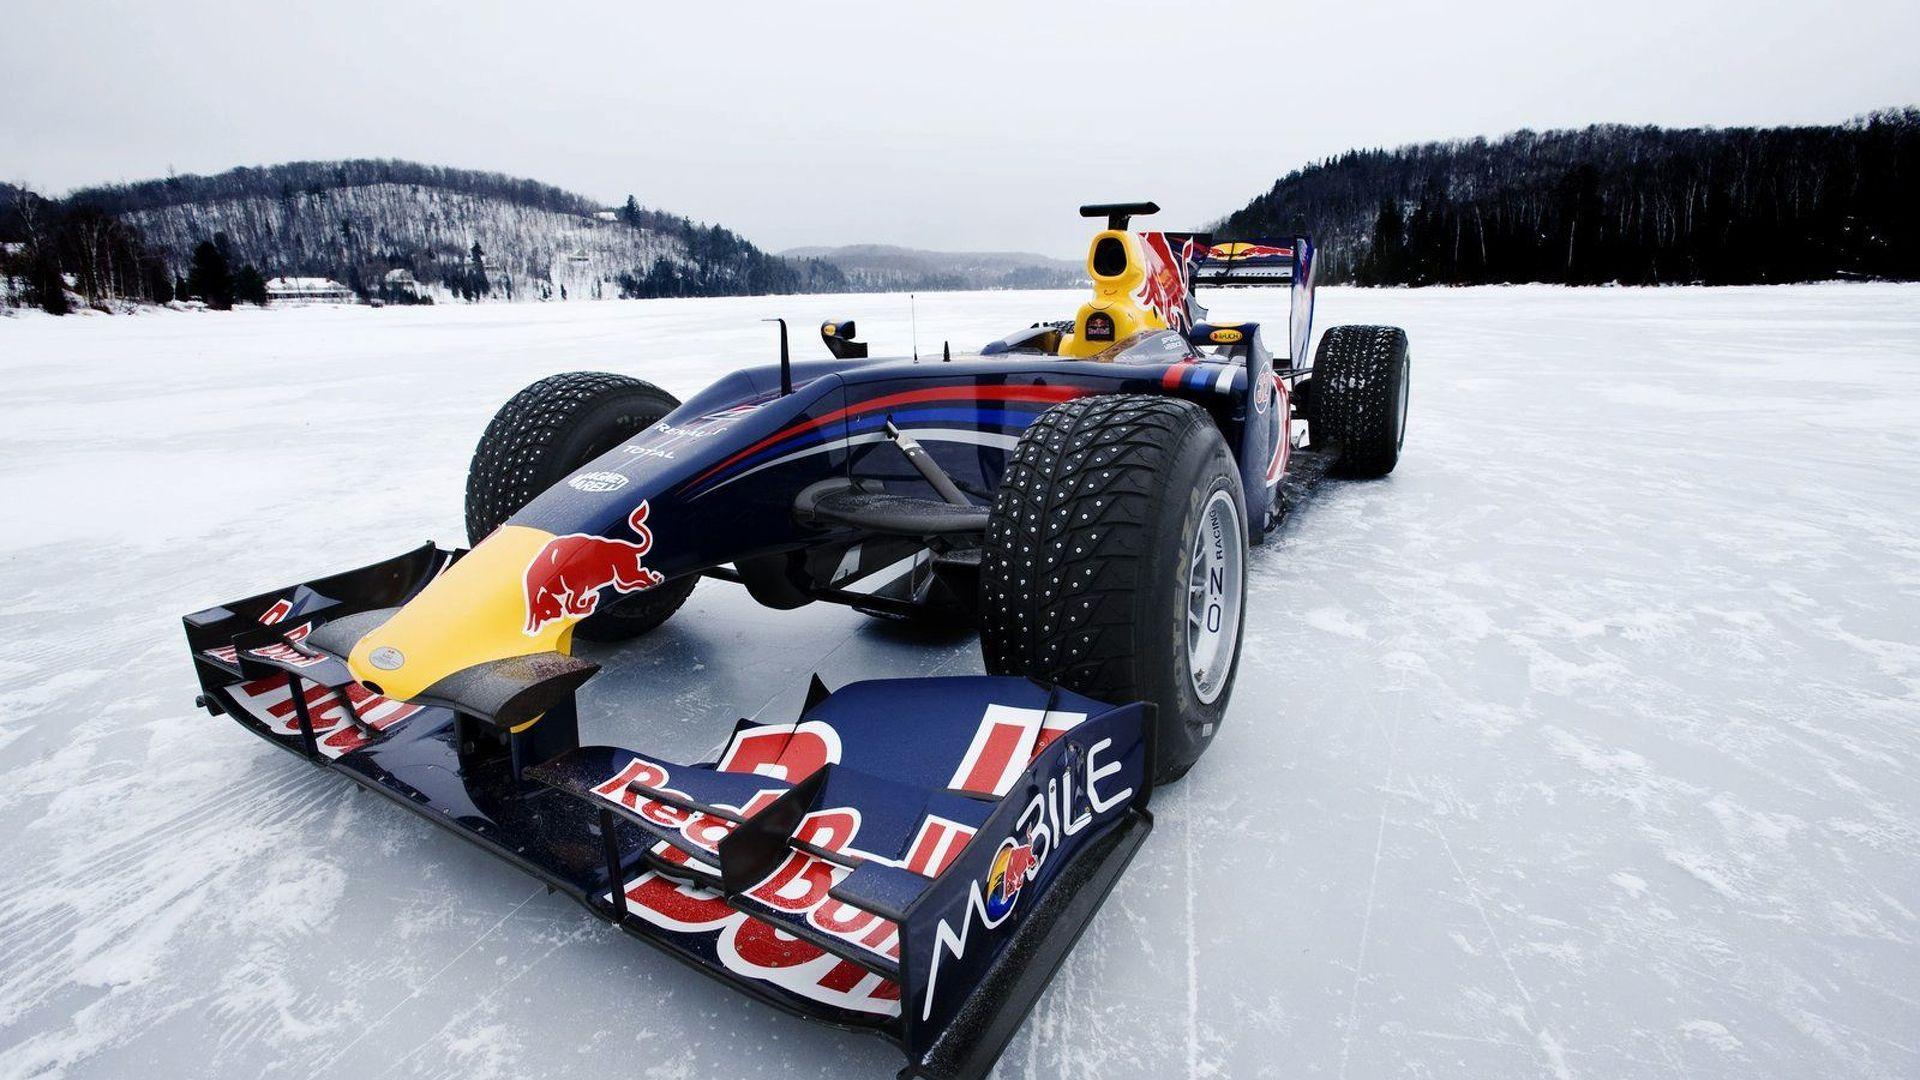 Teams agree to more winter testing - Whitmarsh